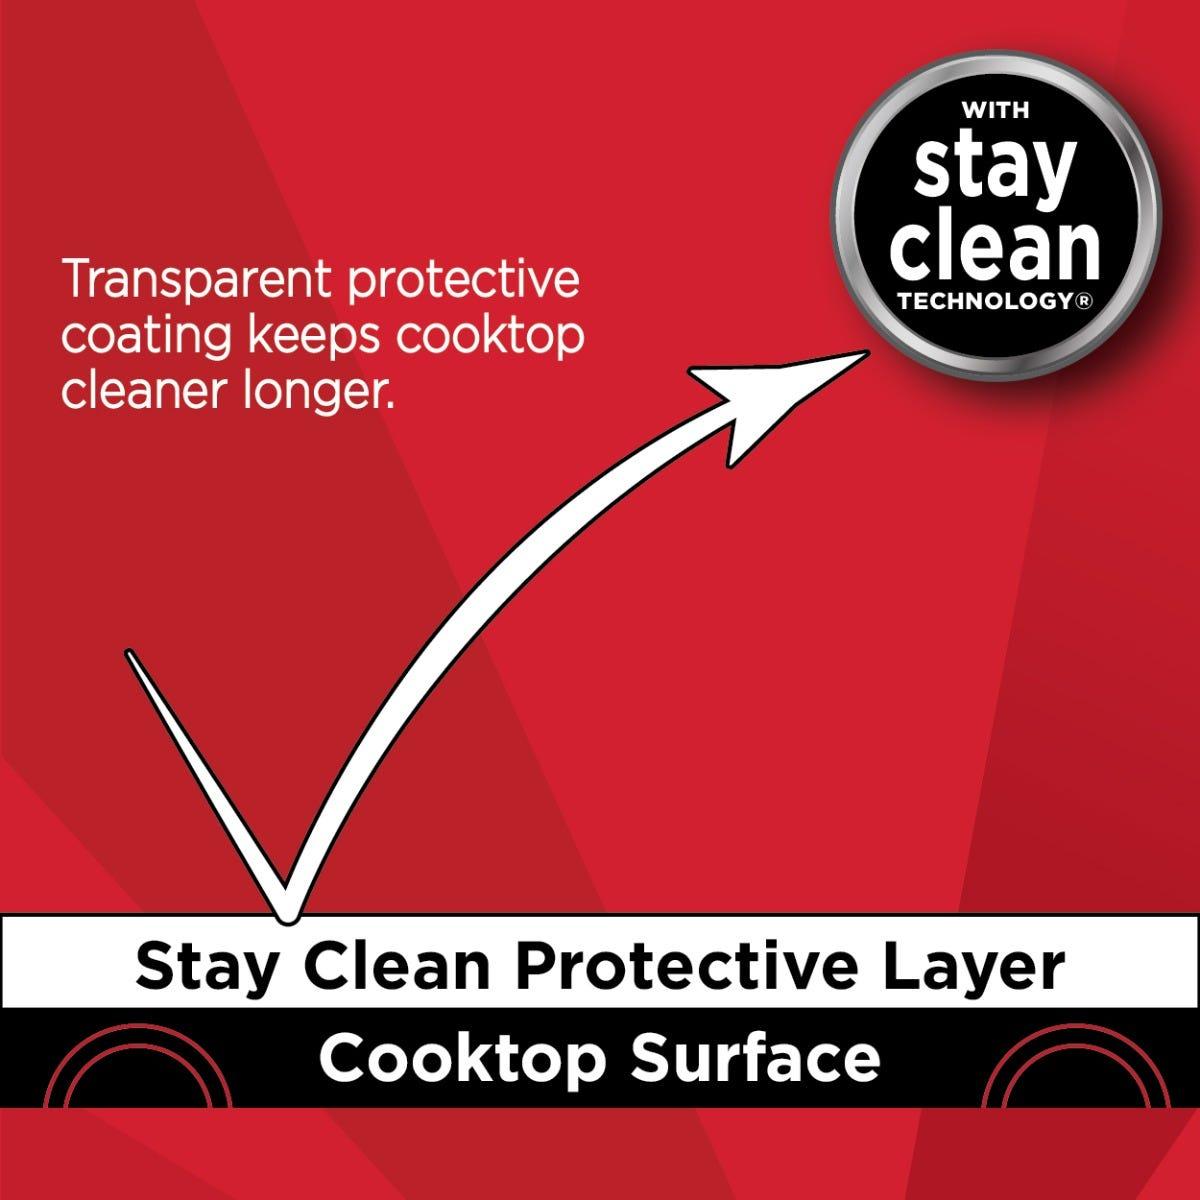 https://googone.com/media/catalog/product/m/a/magic_cooktop_cleaner_polish_benefits.jpg